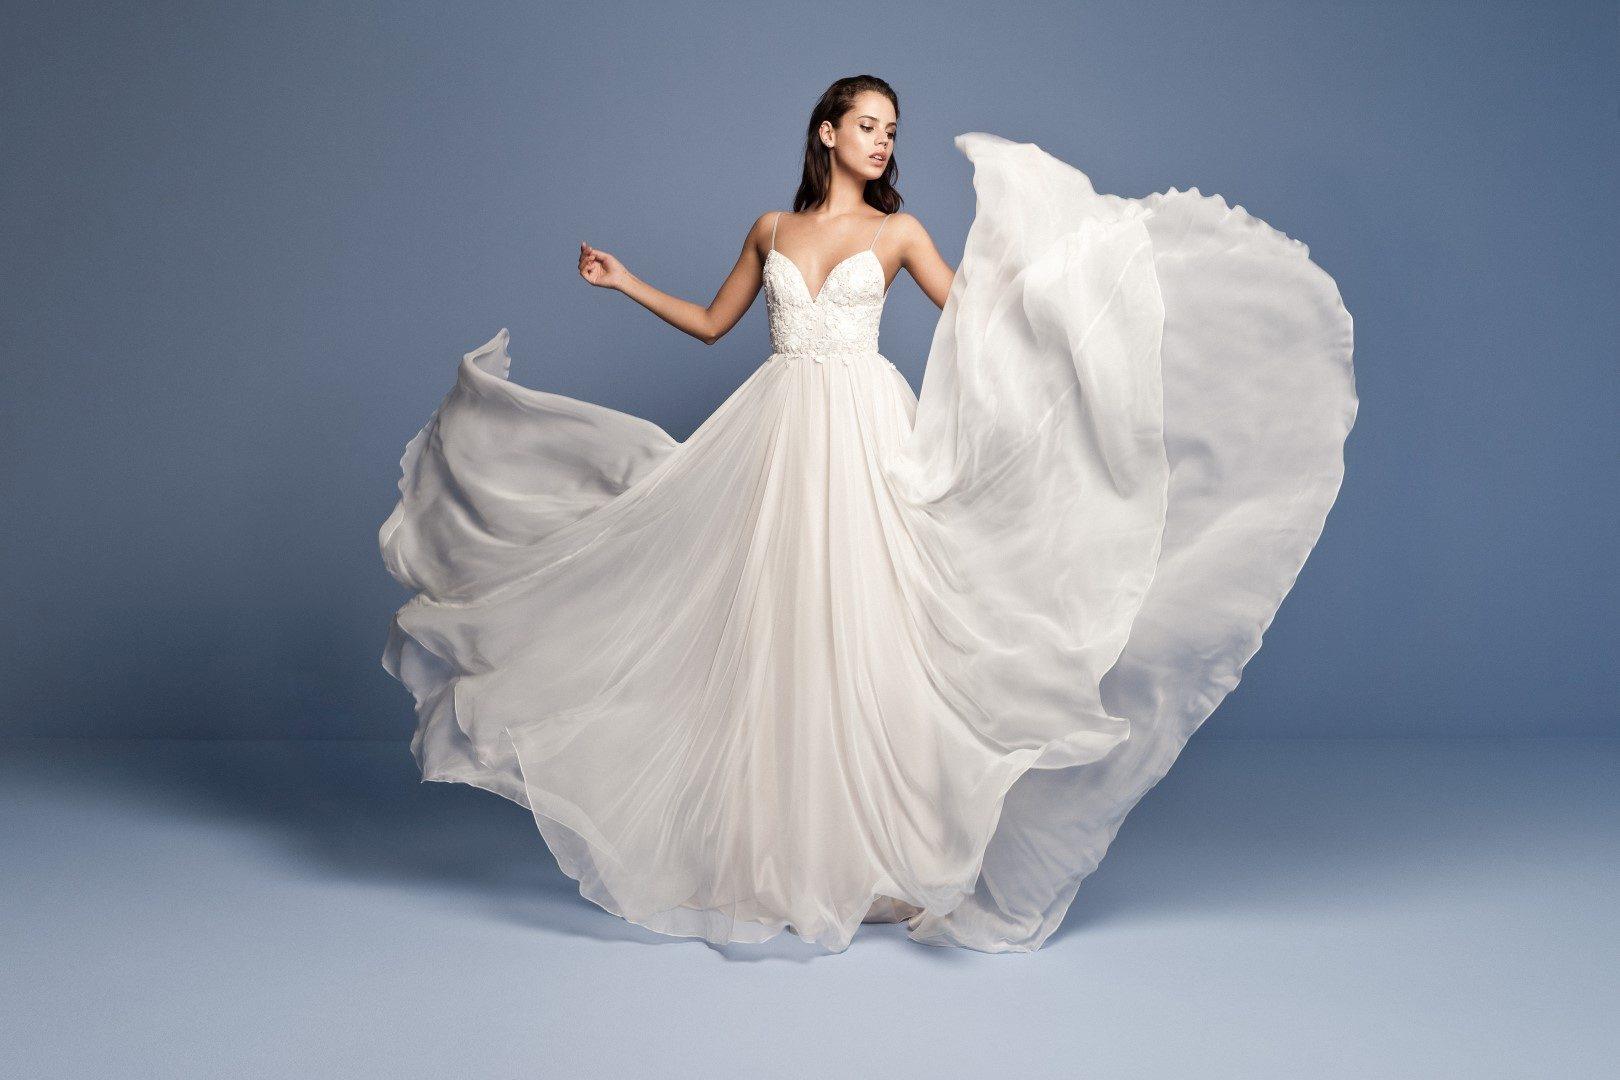 28de24db91 mennyibe kerül egy Daalarna menyasszonyi ruha,daalarna ruha ára,esküvői ruha  ára,